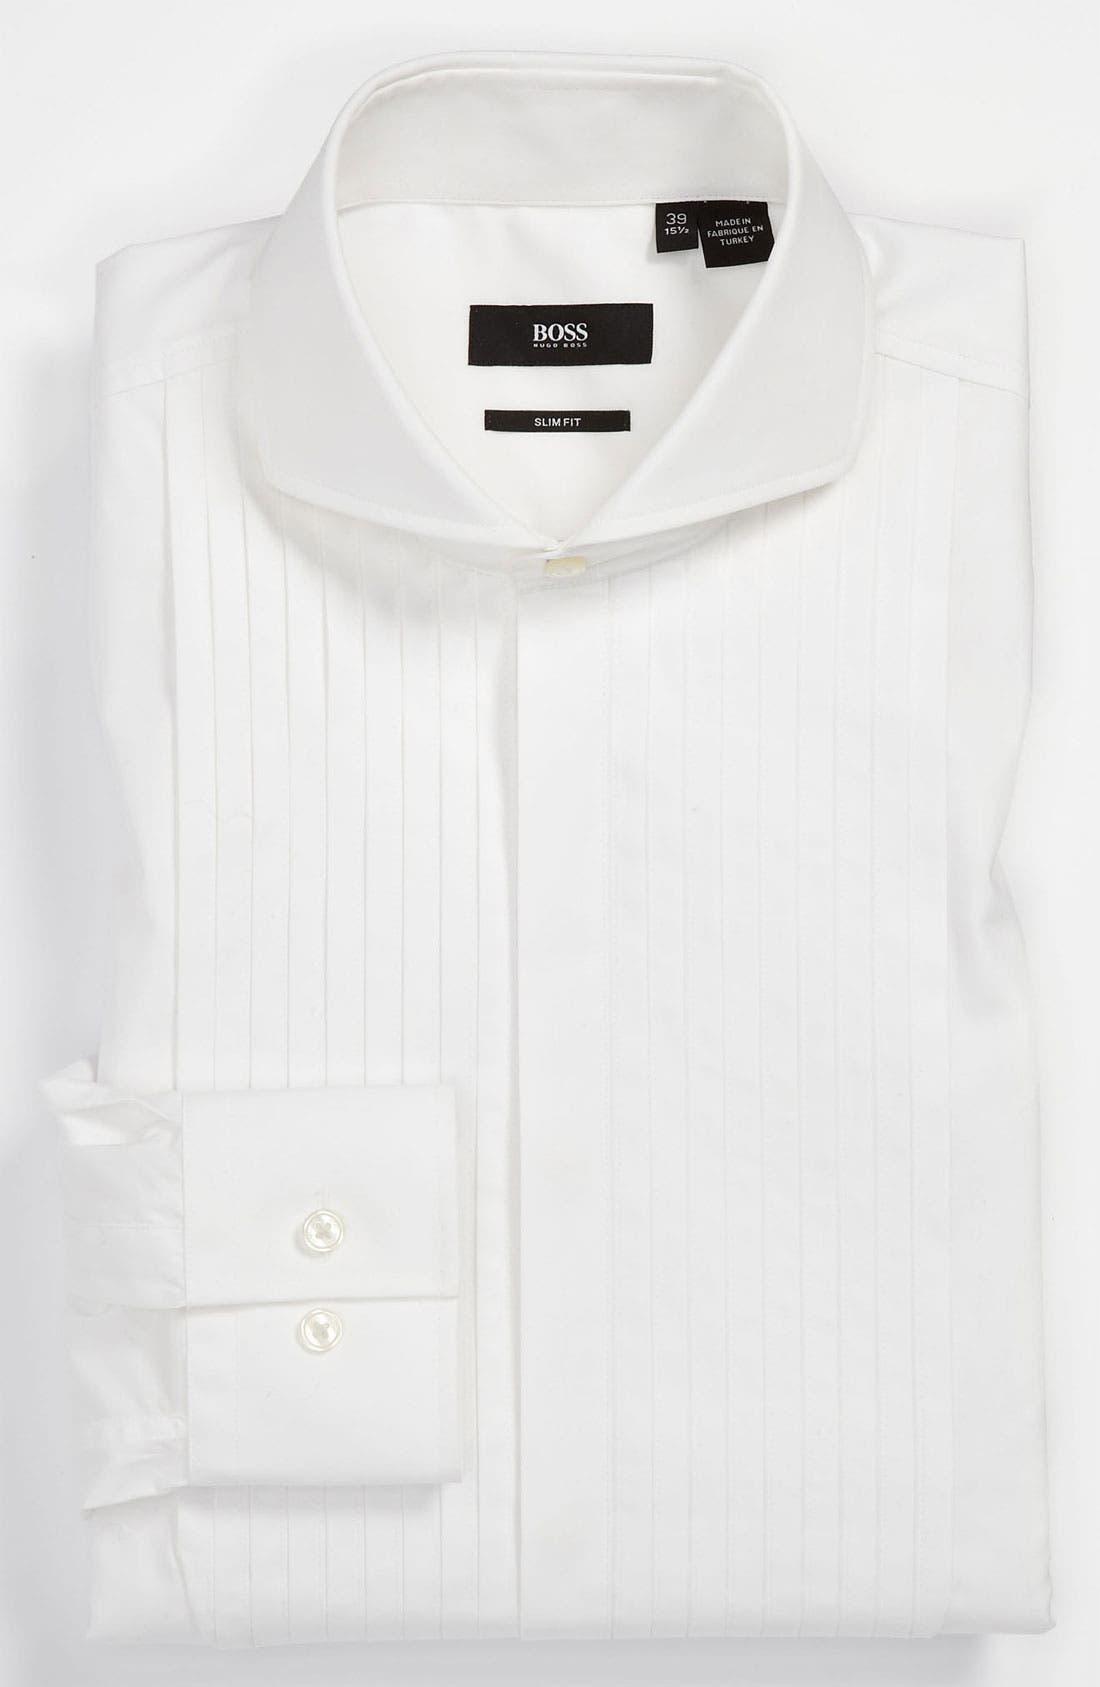 Main Image - BOSS Black Slim Fit Tuxedo Shirt